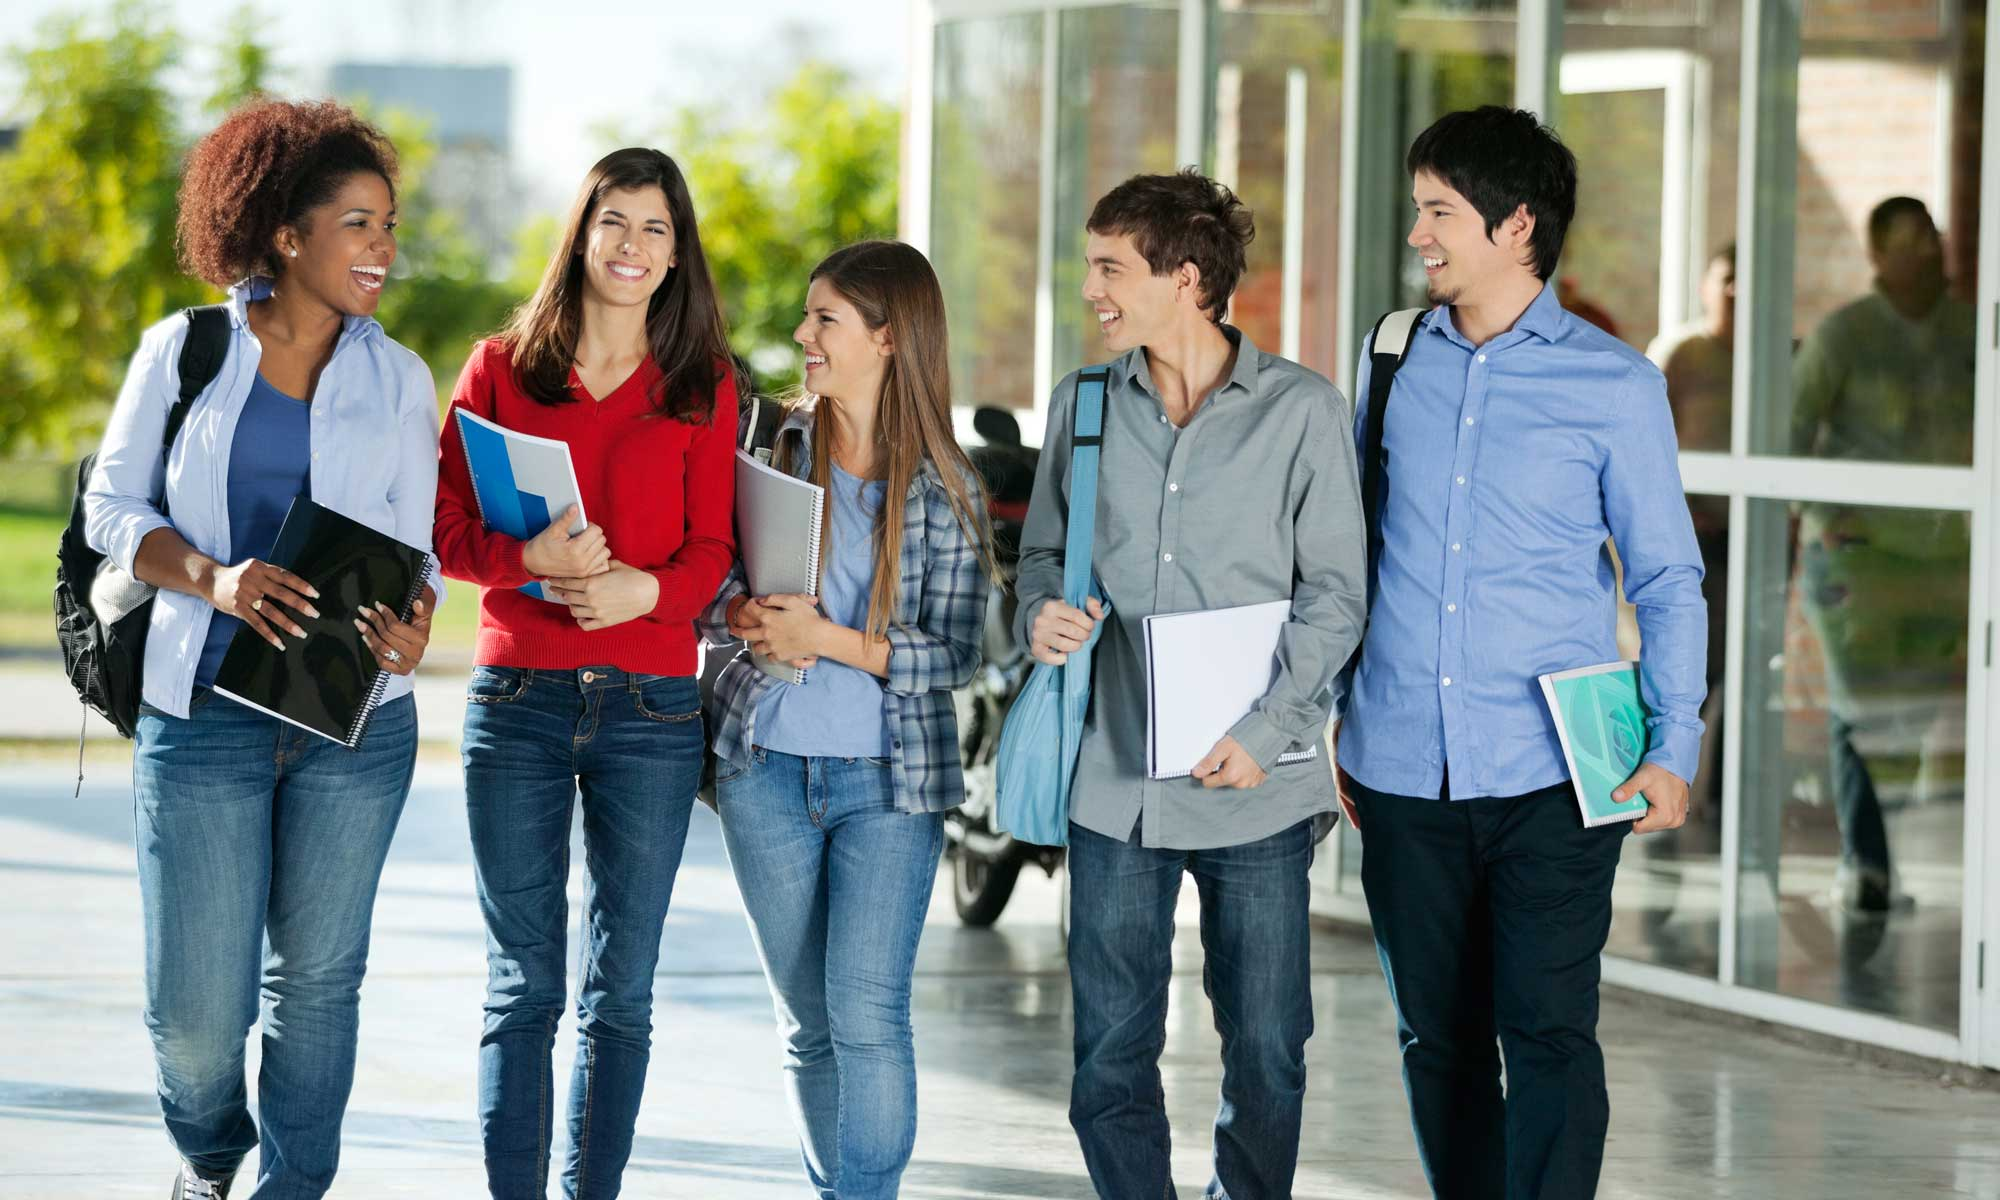 London International Students Clinic